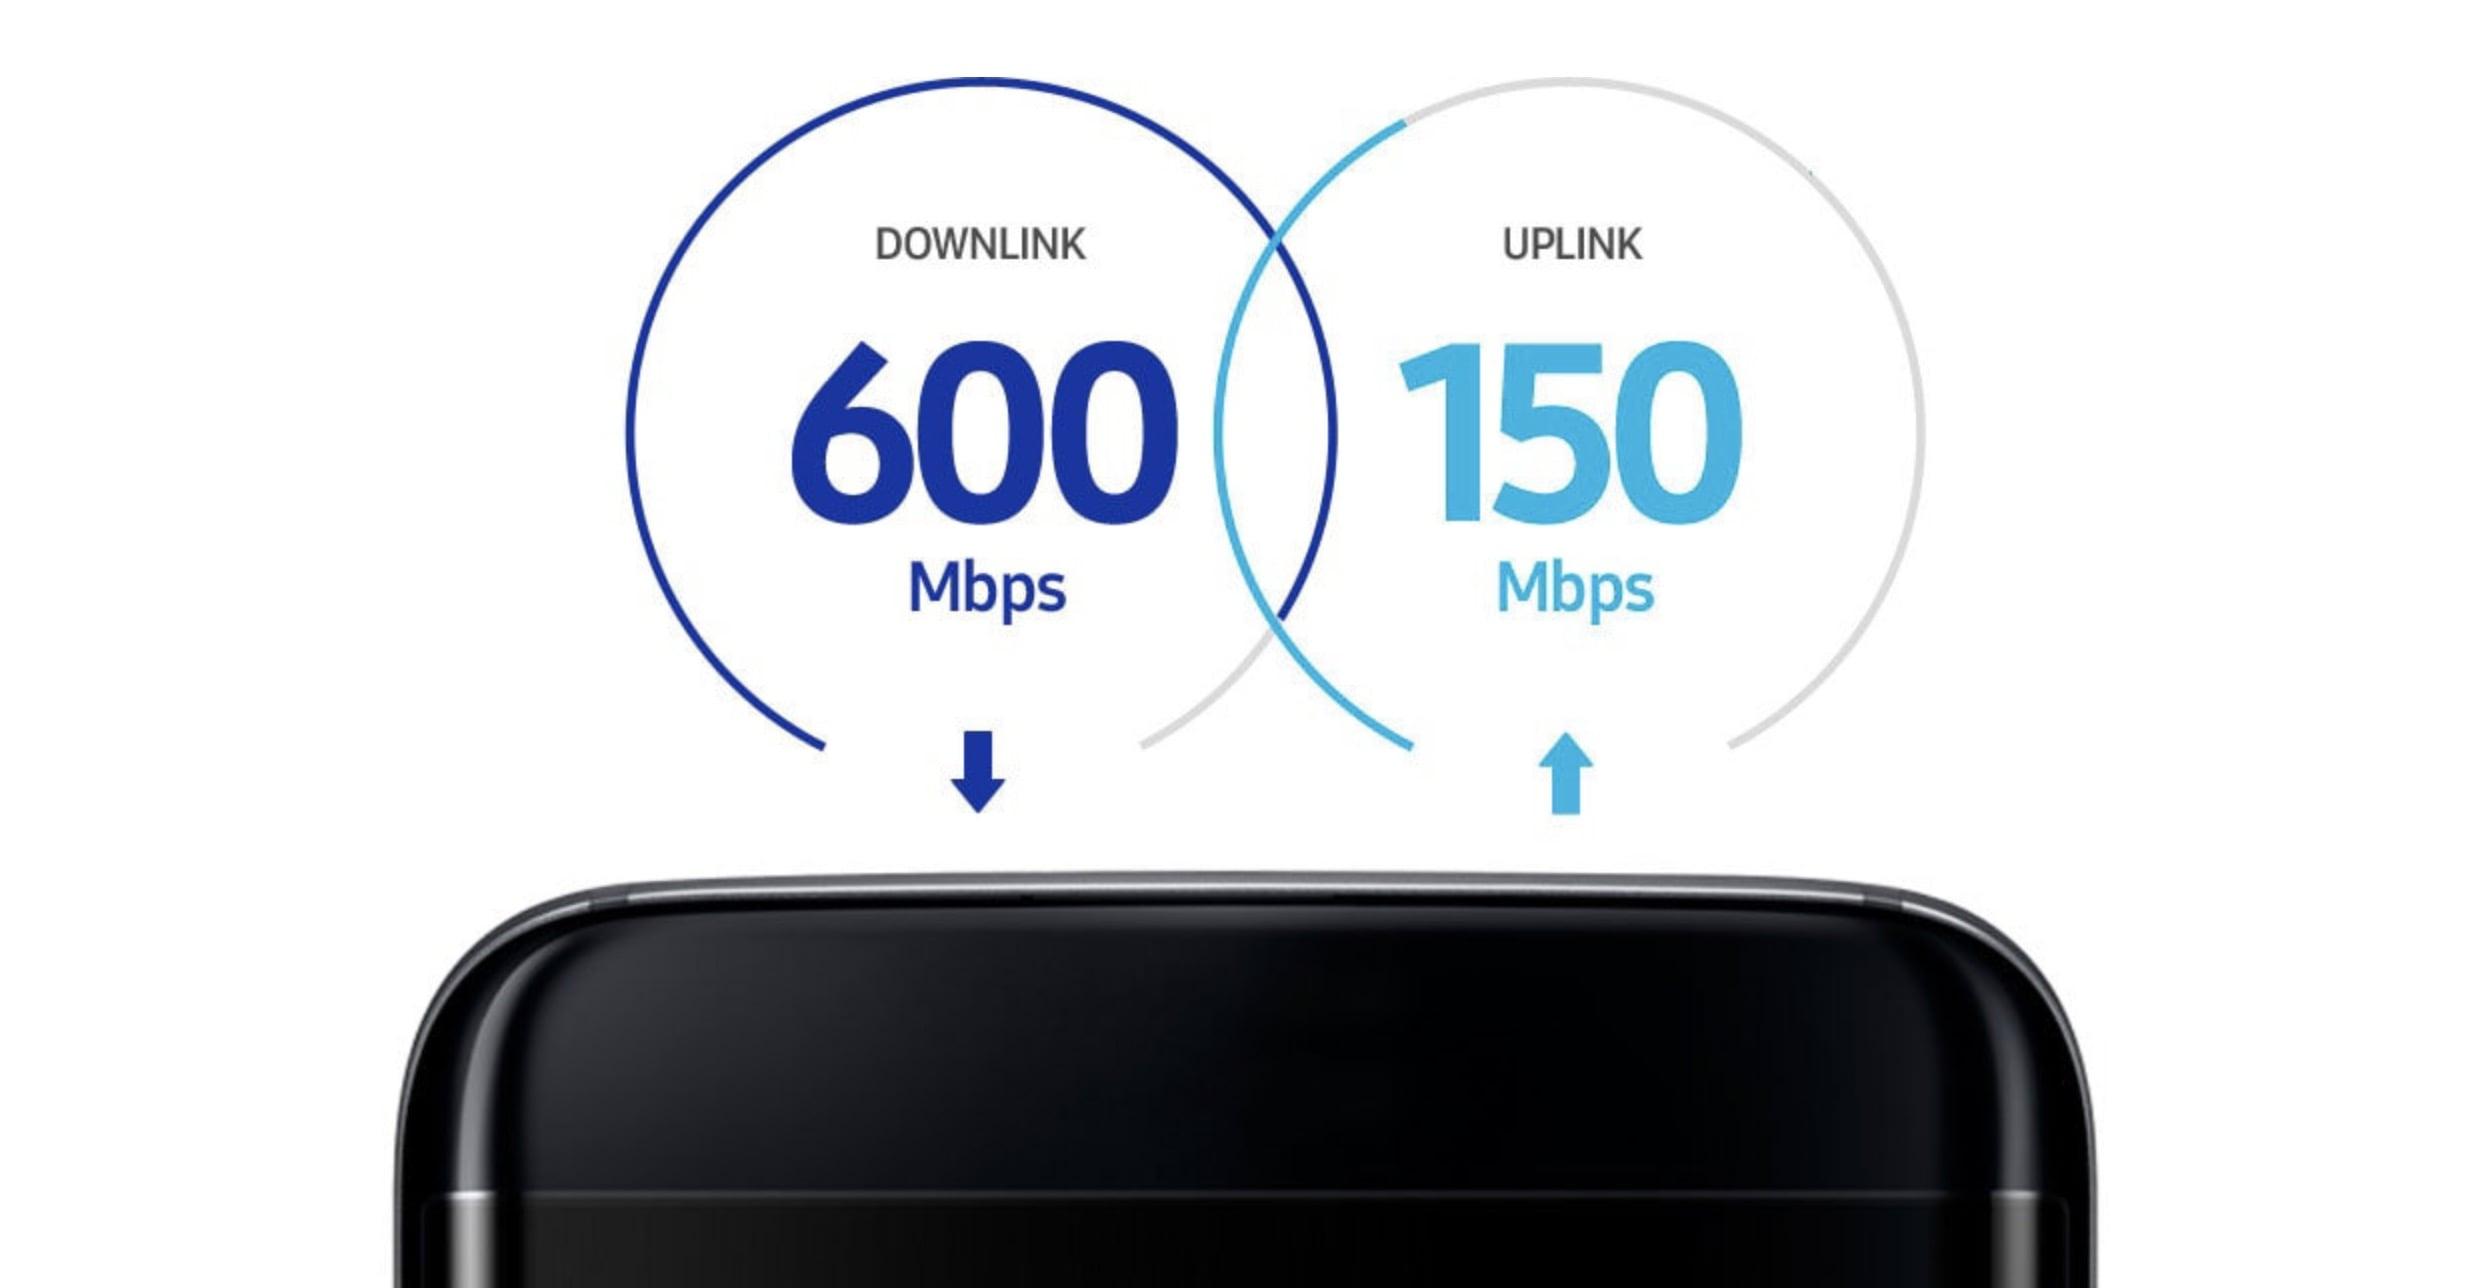 Samsung Exynos 8 Octa 8890-2